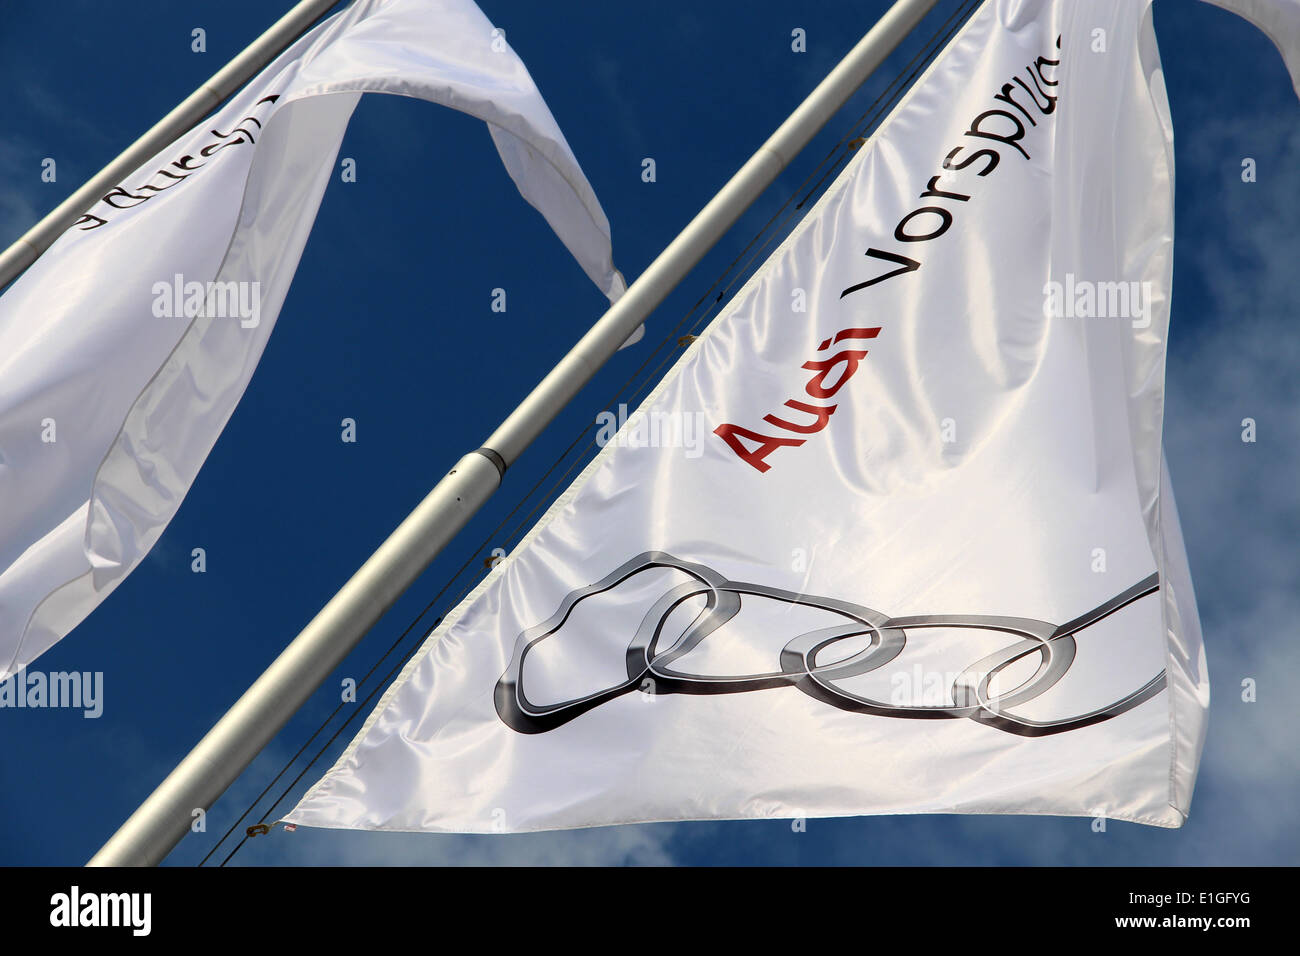 Audi Ag Stock Photos & Audi Ag Stock Images - Alamy